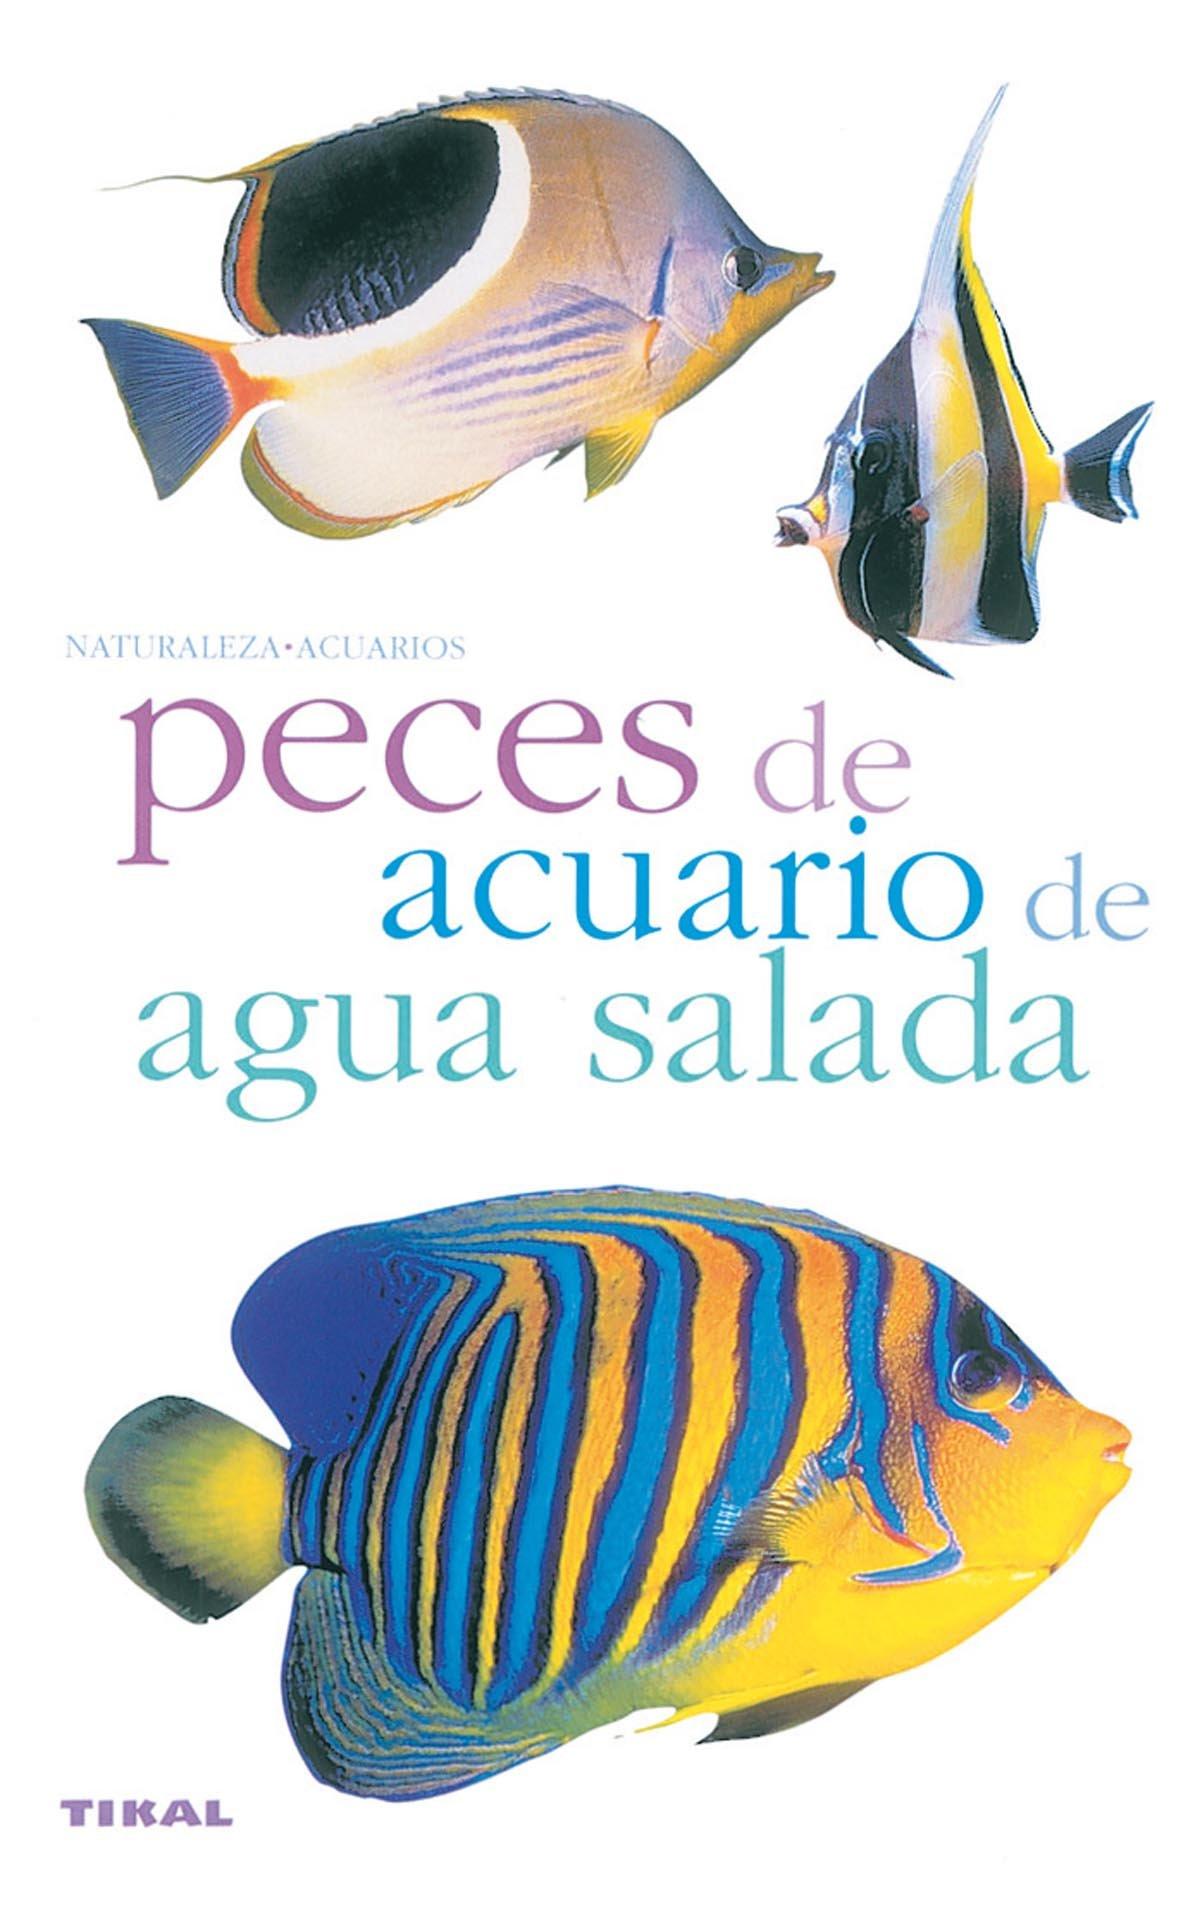 Peces de acuario de agua salada (Spanish) Paperback – 2005